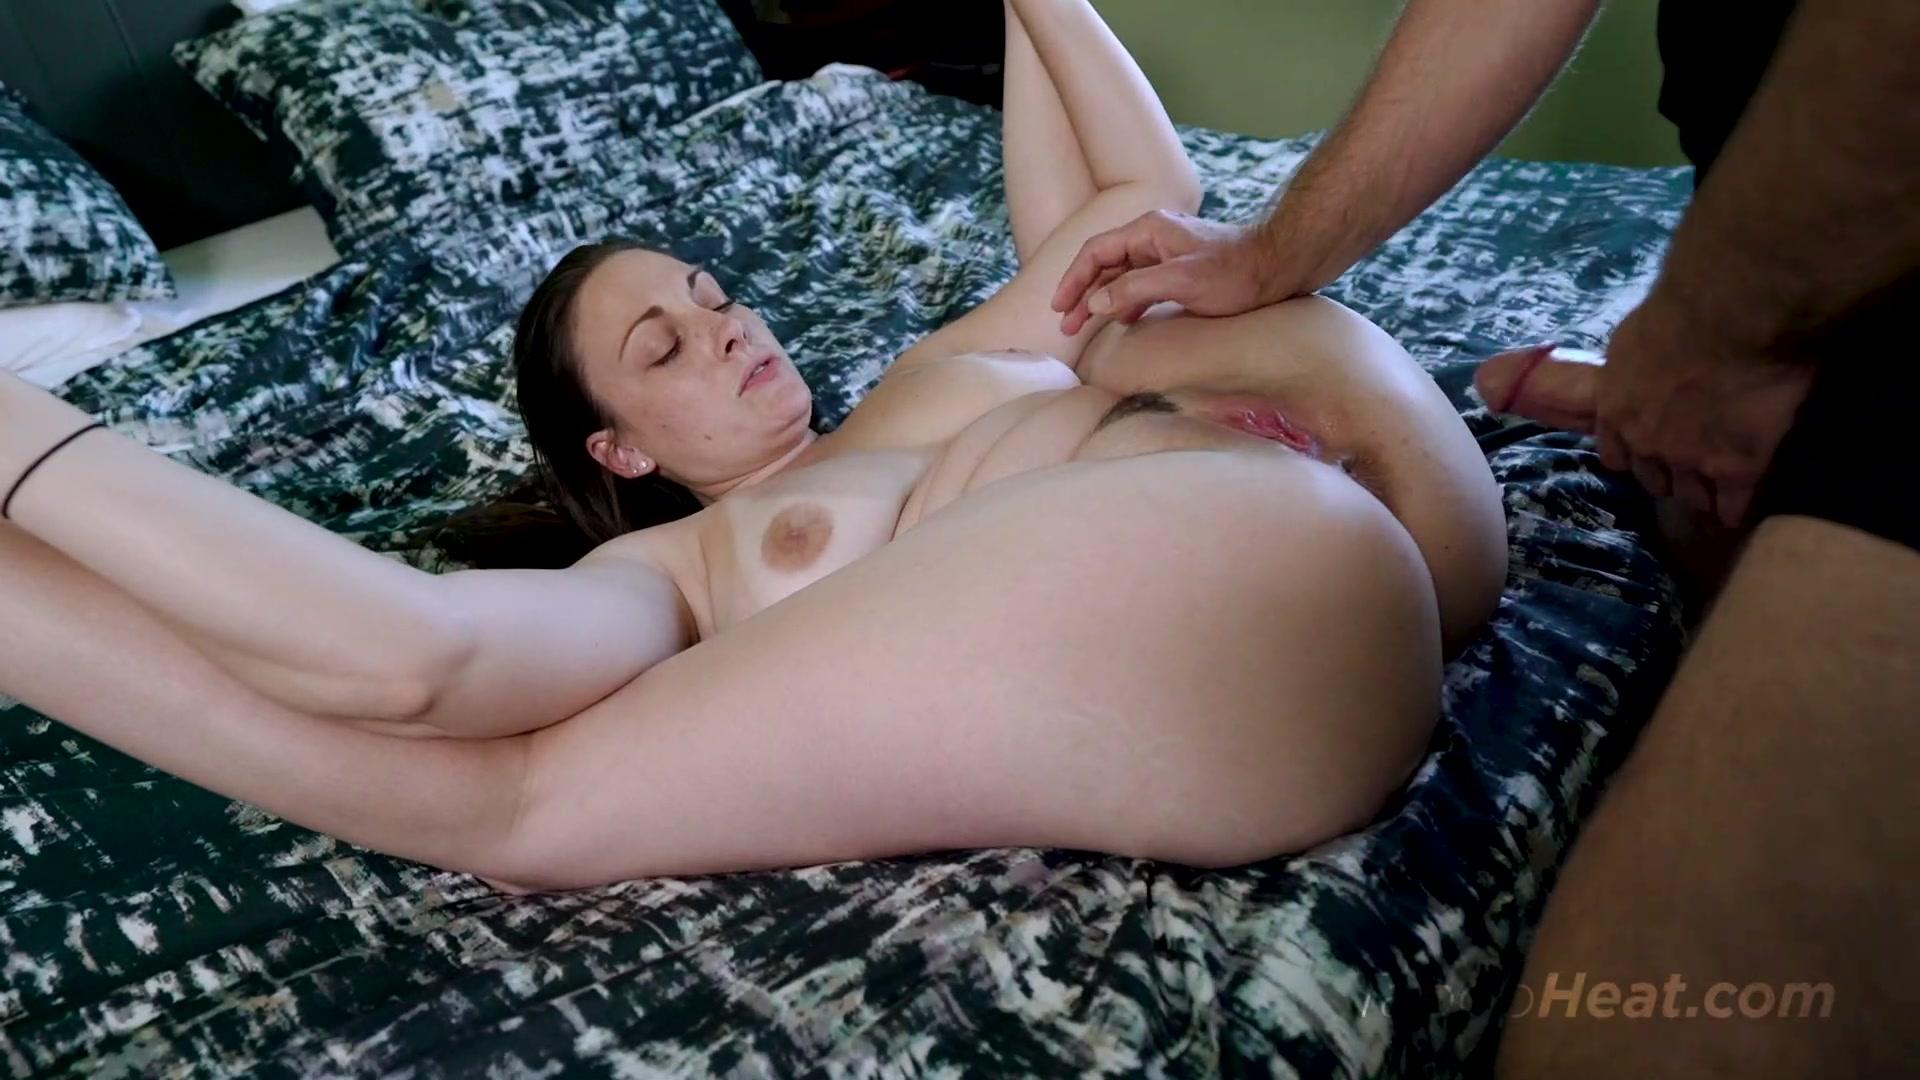 Tgirl Stepmom Melanie Brooks Shows Her Shedick And Fucks Stepson